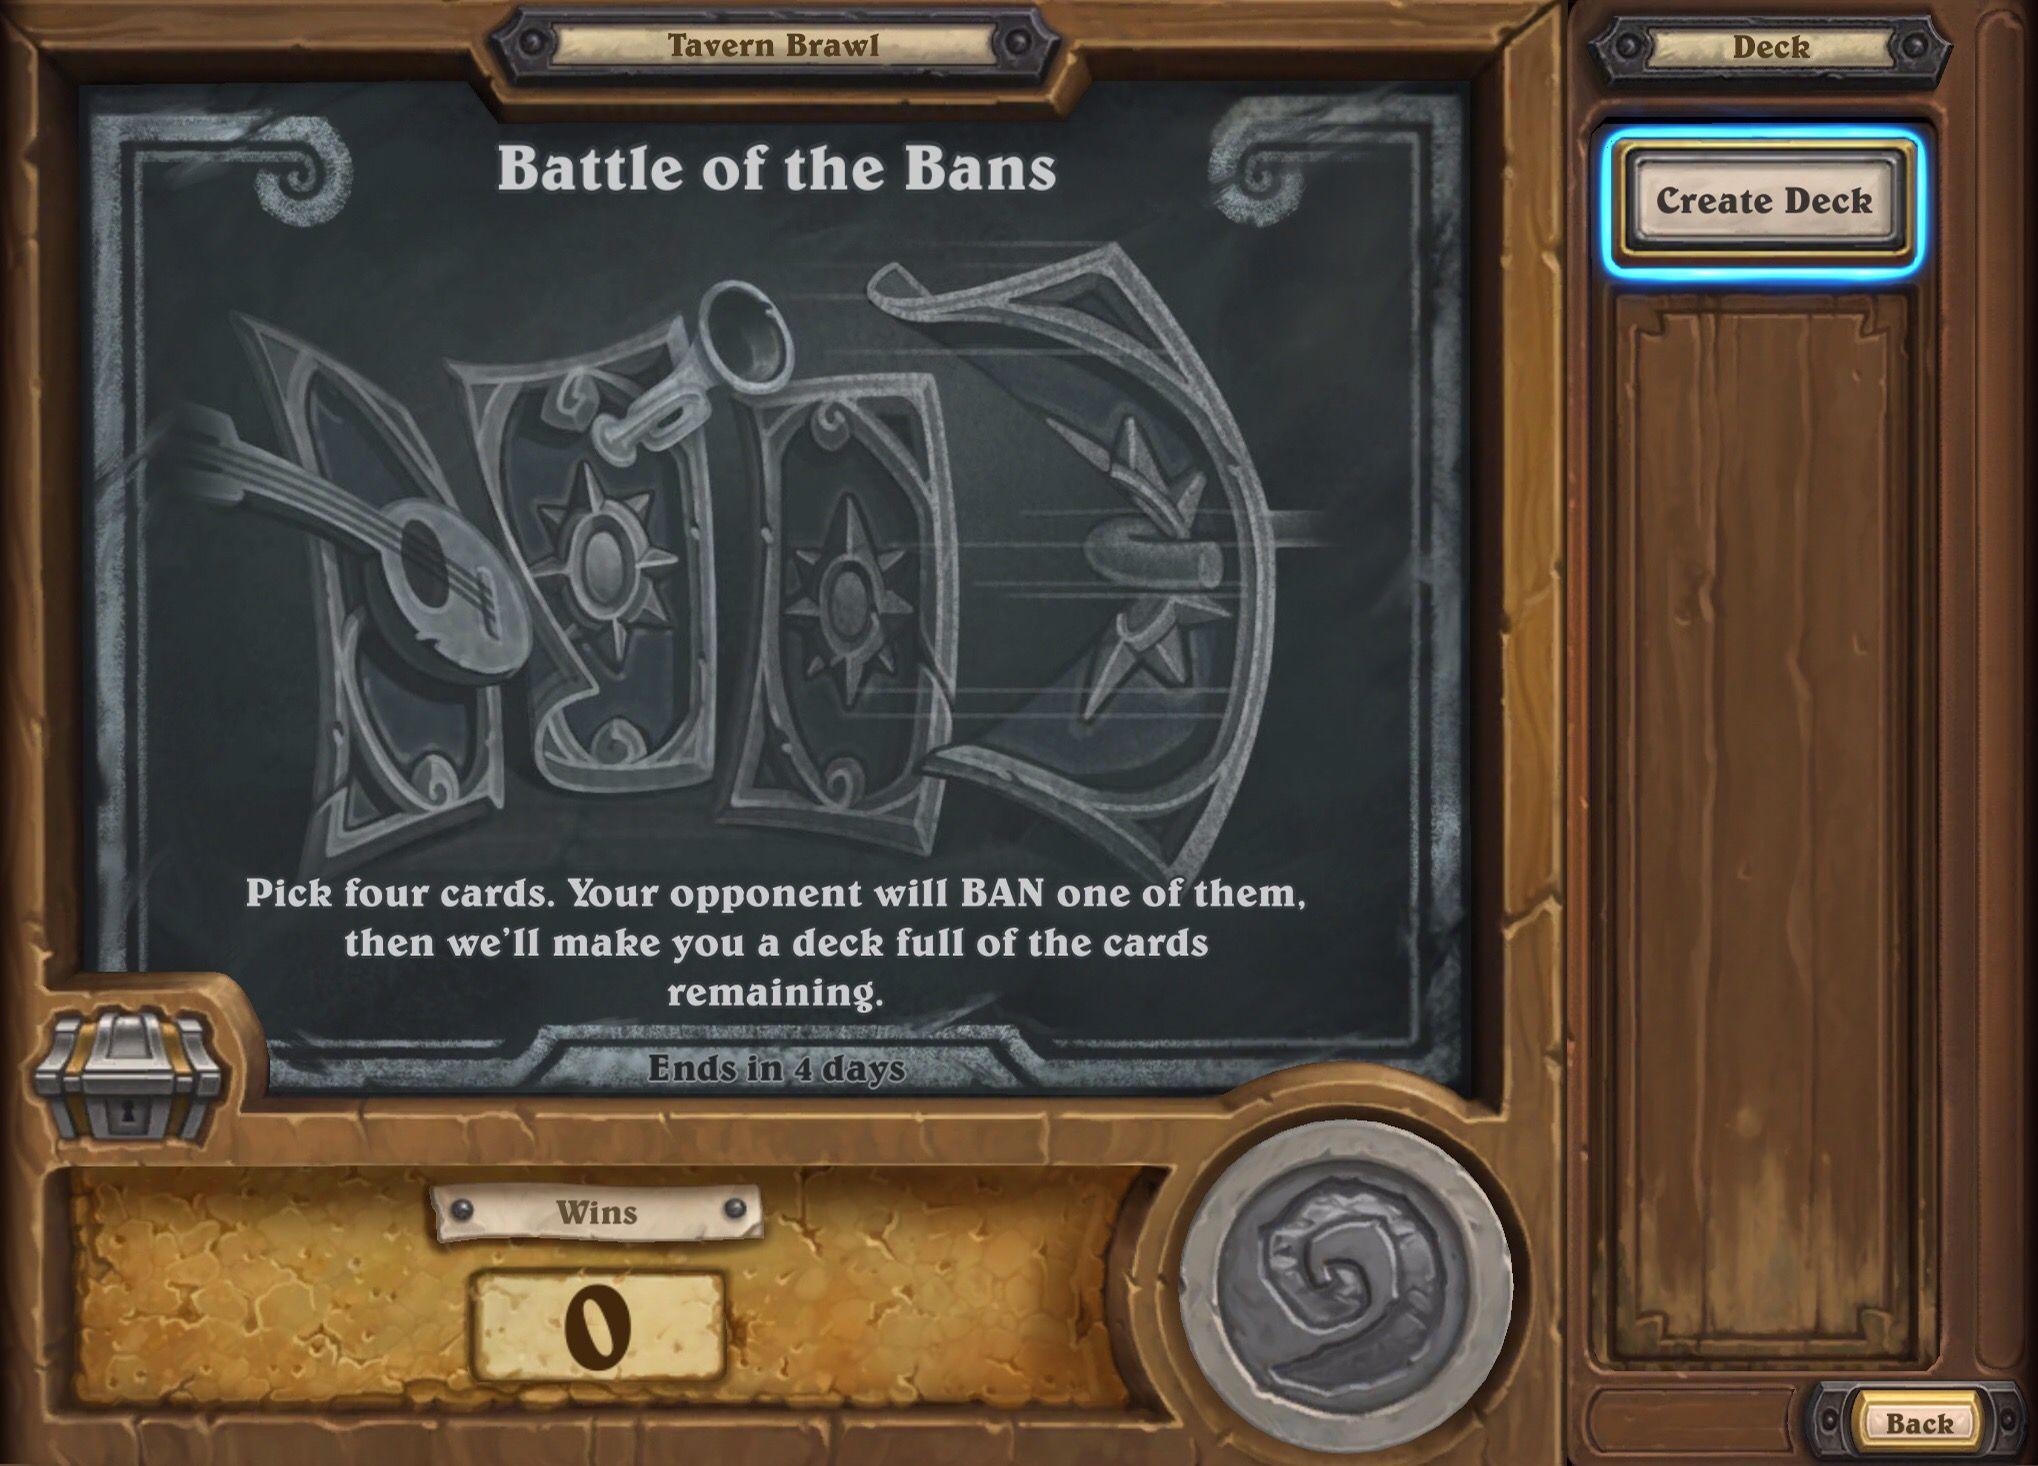 hearthstone tavern brawl battle of the bans guide deck list best class